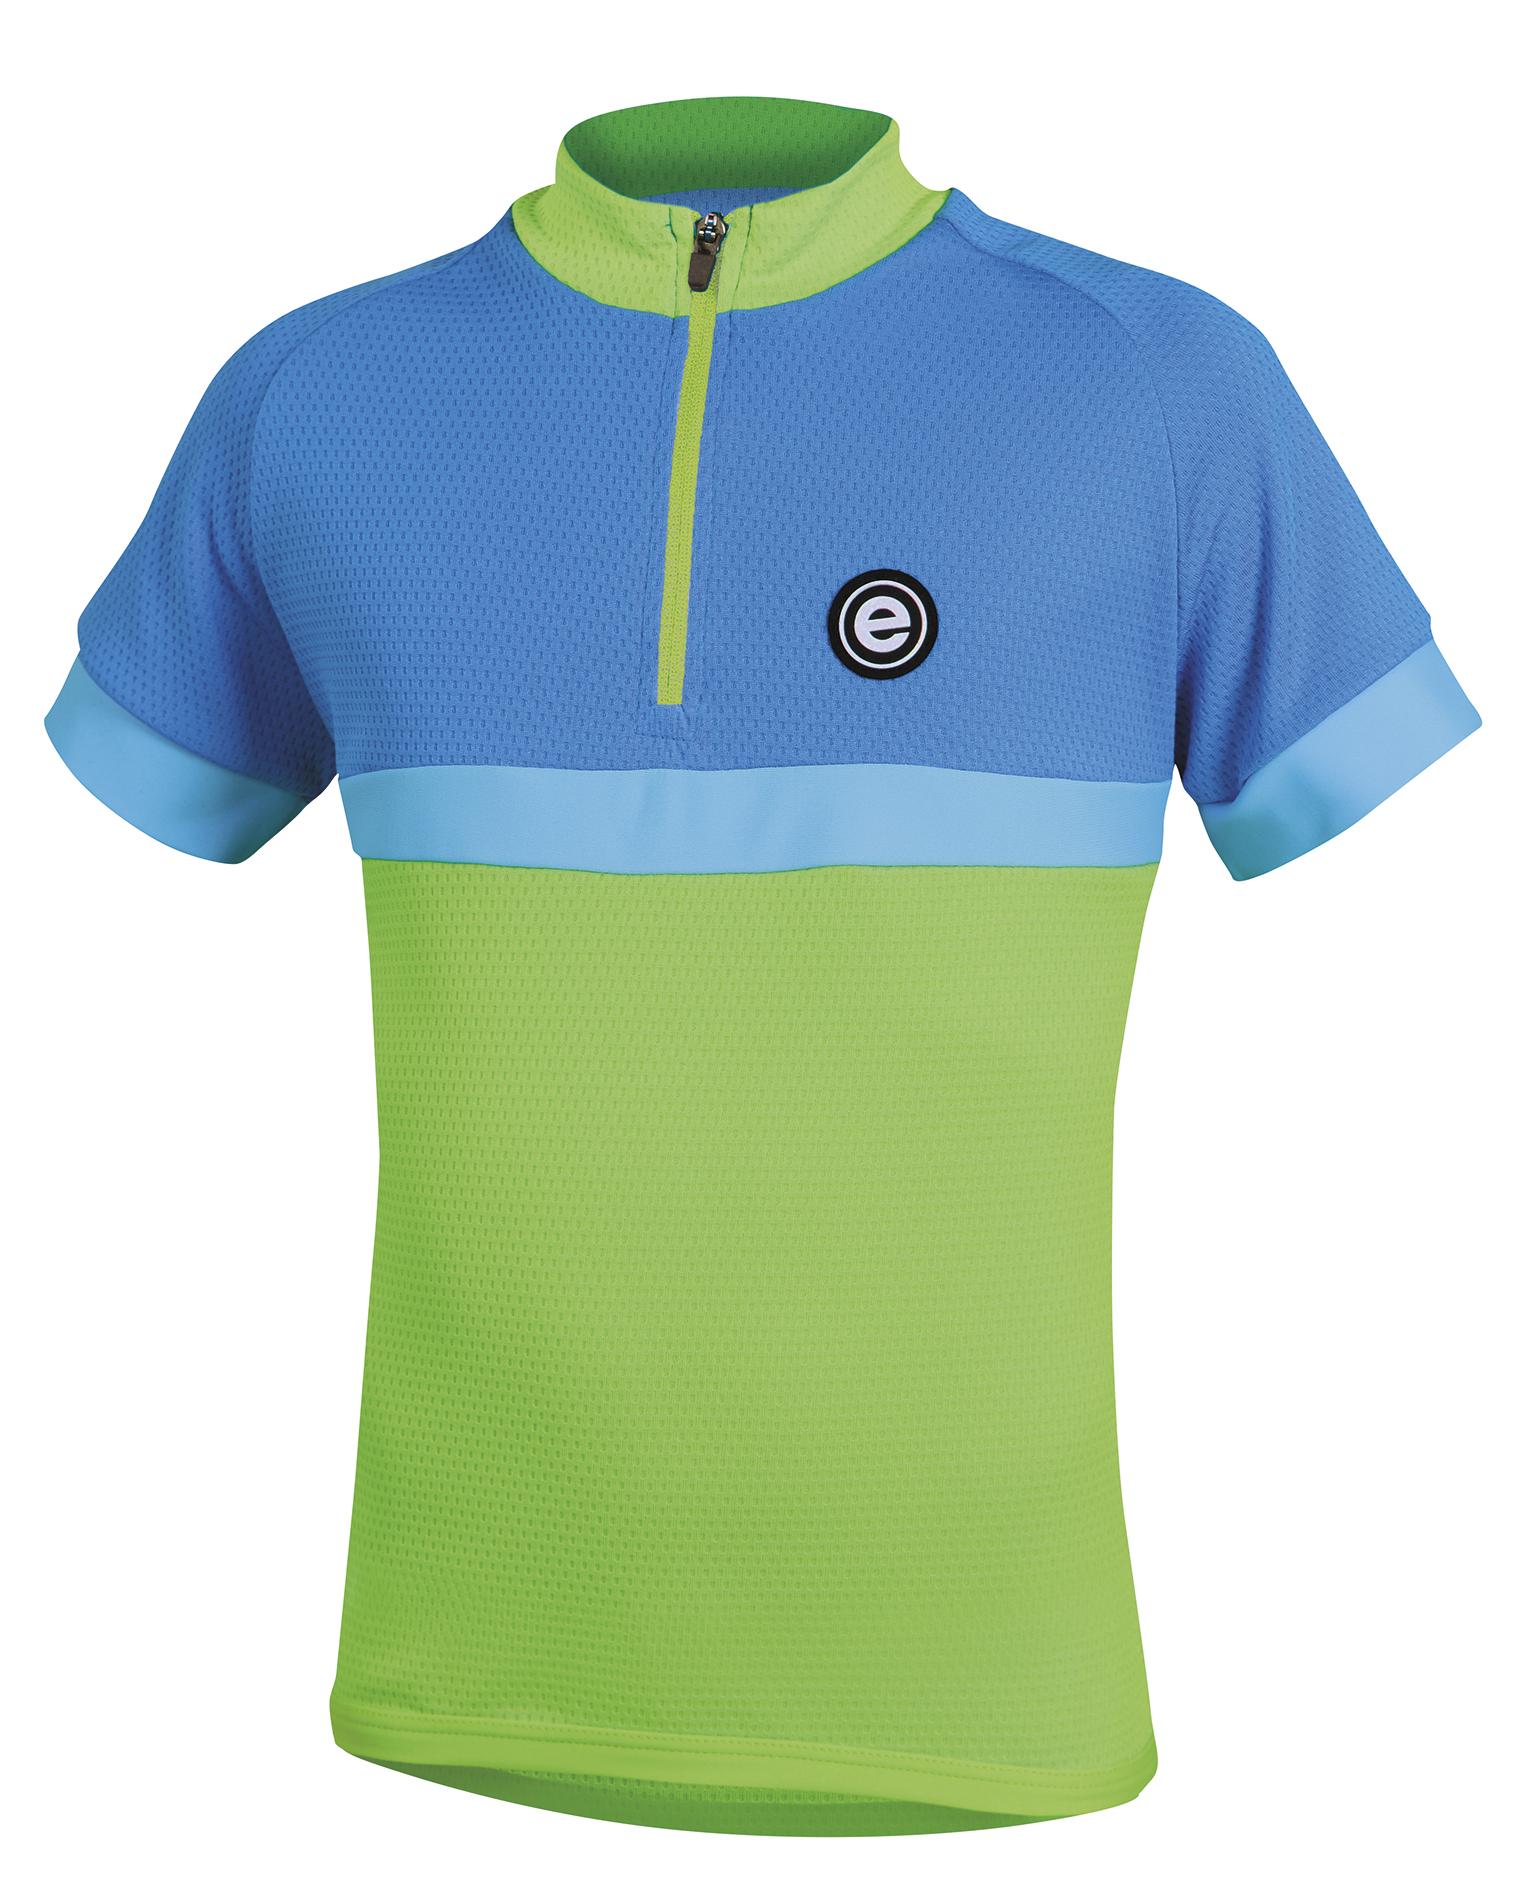 Dětský cyklistický dres ETAPE Bambino, 152/158, zelená/modrá, model 2017 (Dětský dres Etape, přední zip)